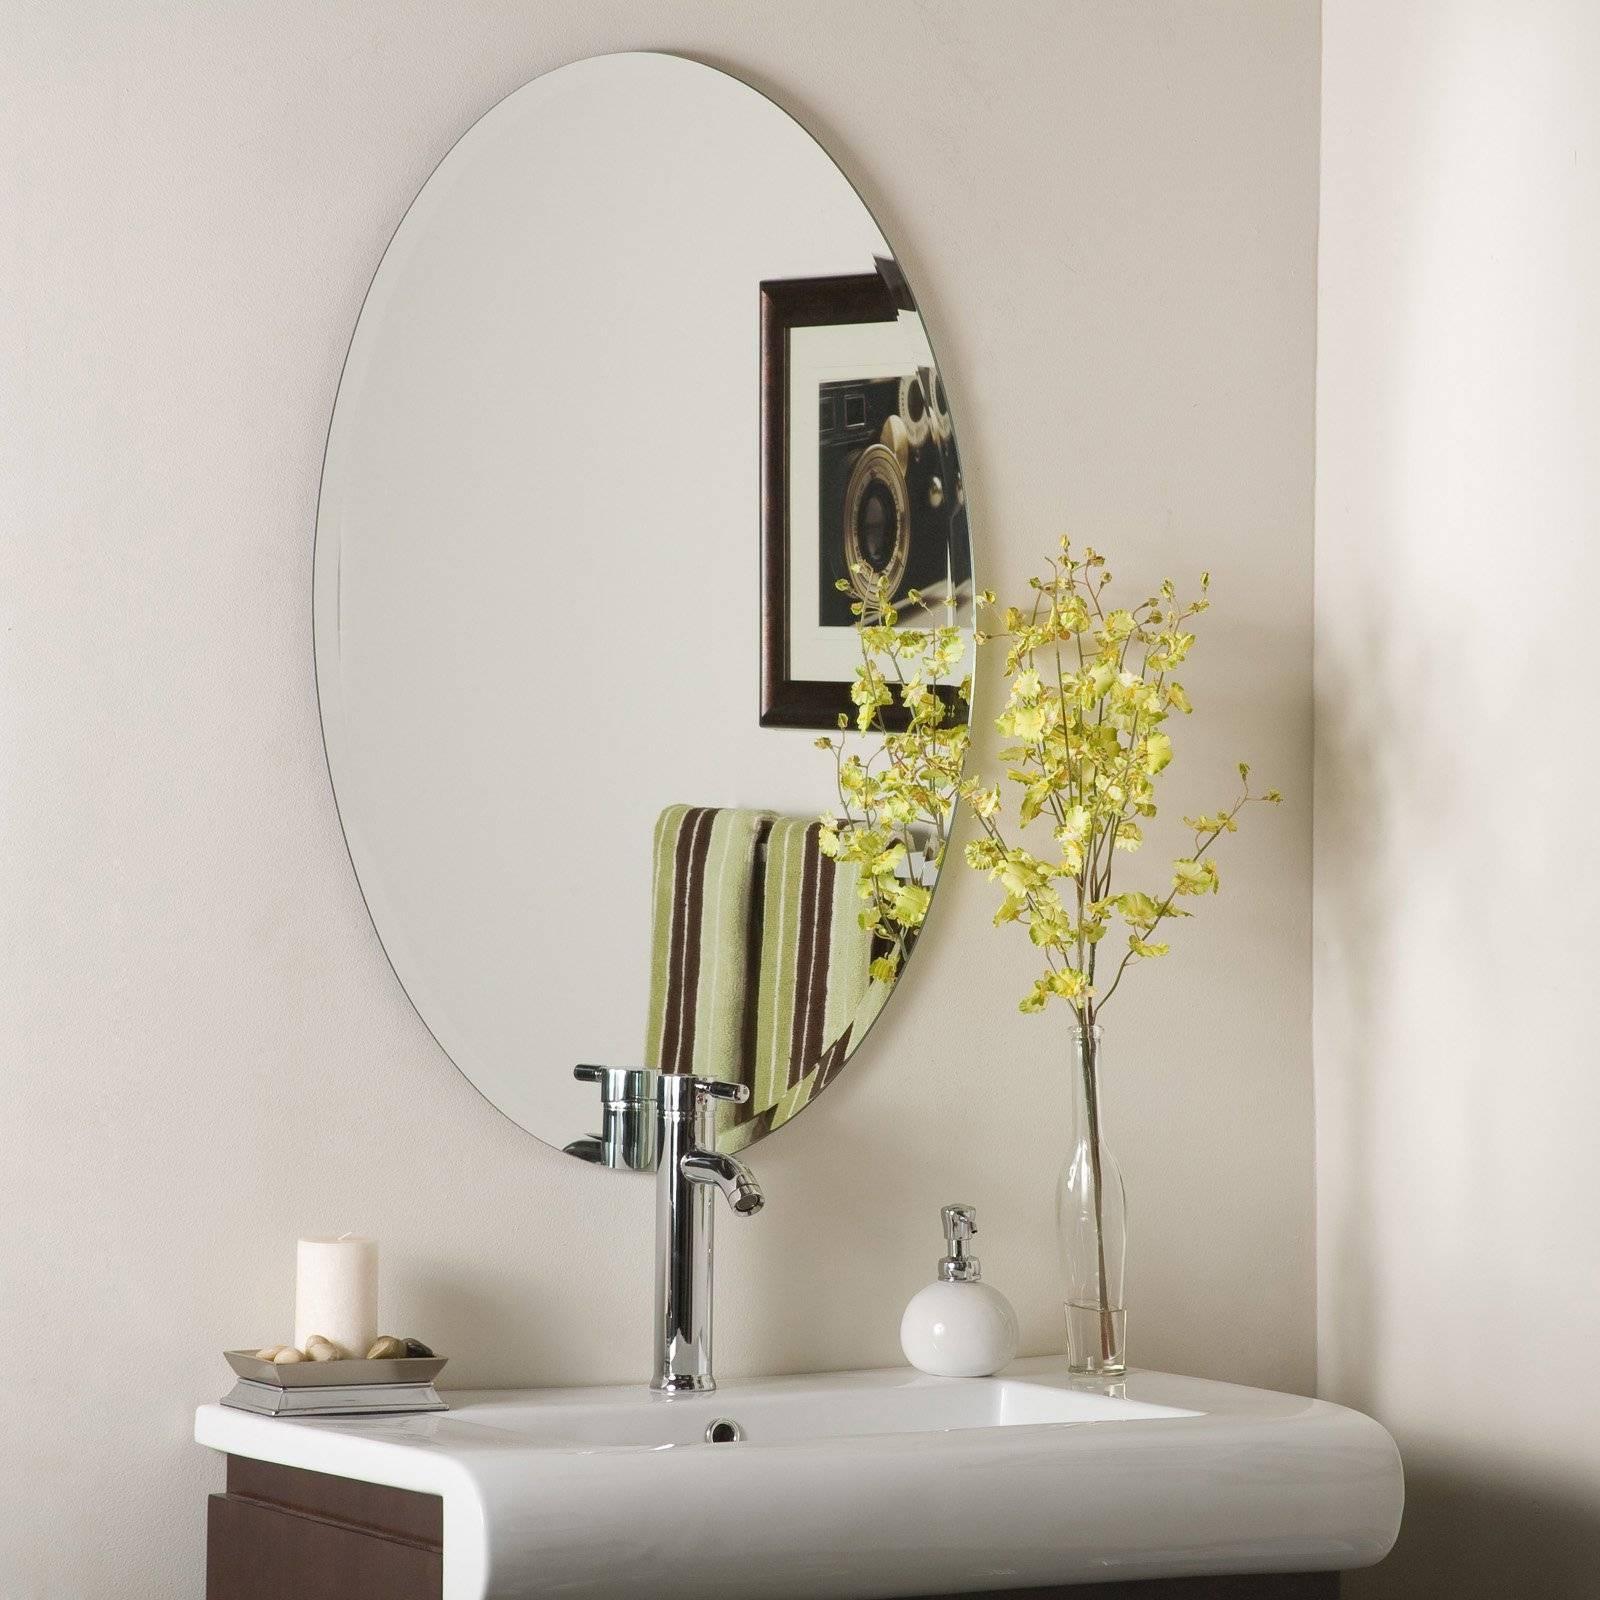 Uttermost Frameless Oval Beveled Vanity Mirror | Hayneedle in Frameless Wall Mirrors (Image 15 of 15)